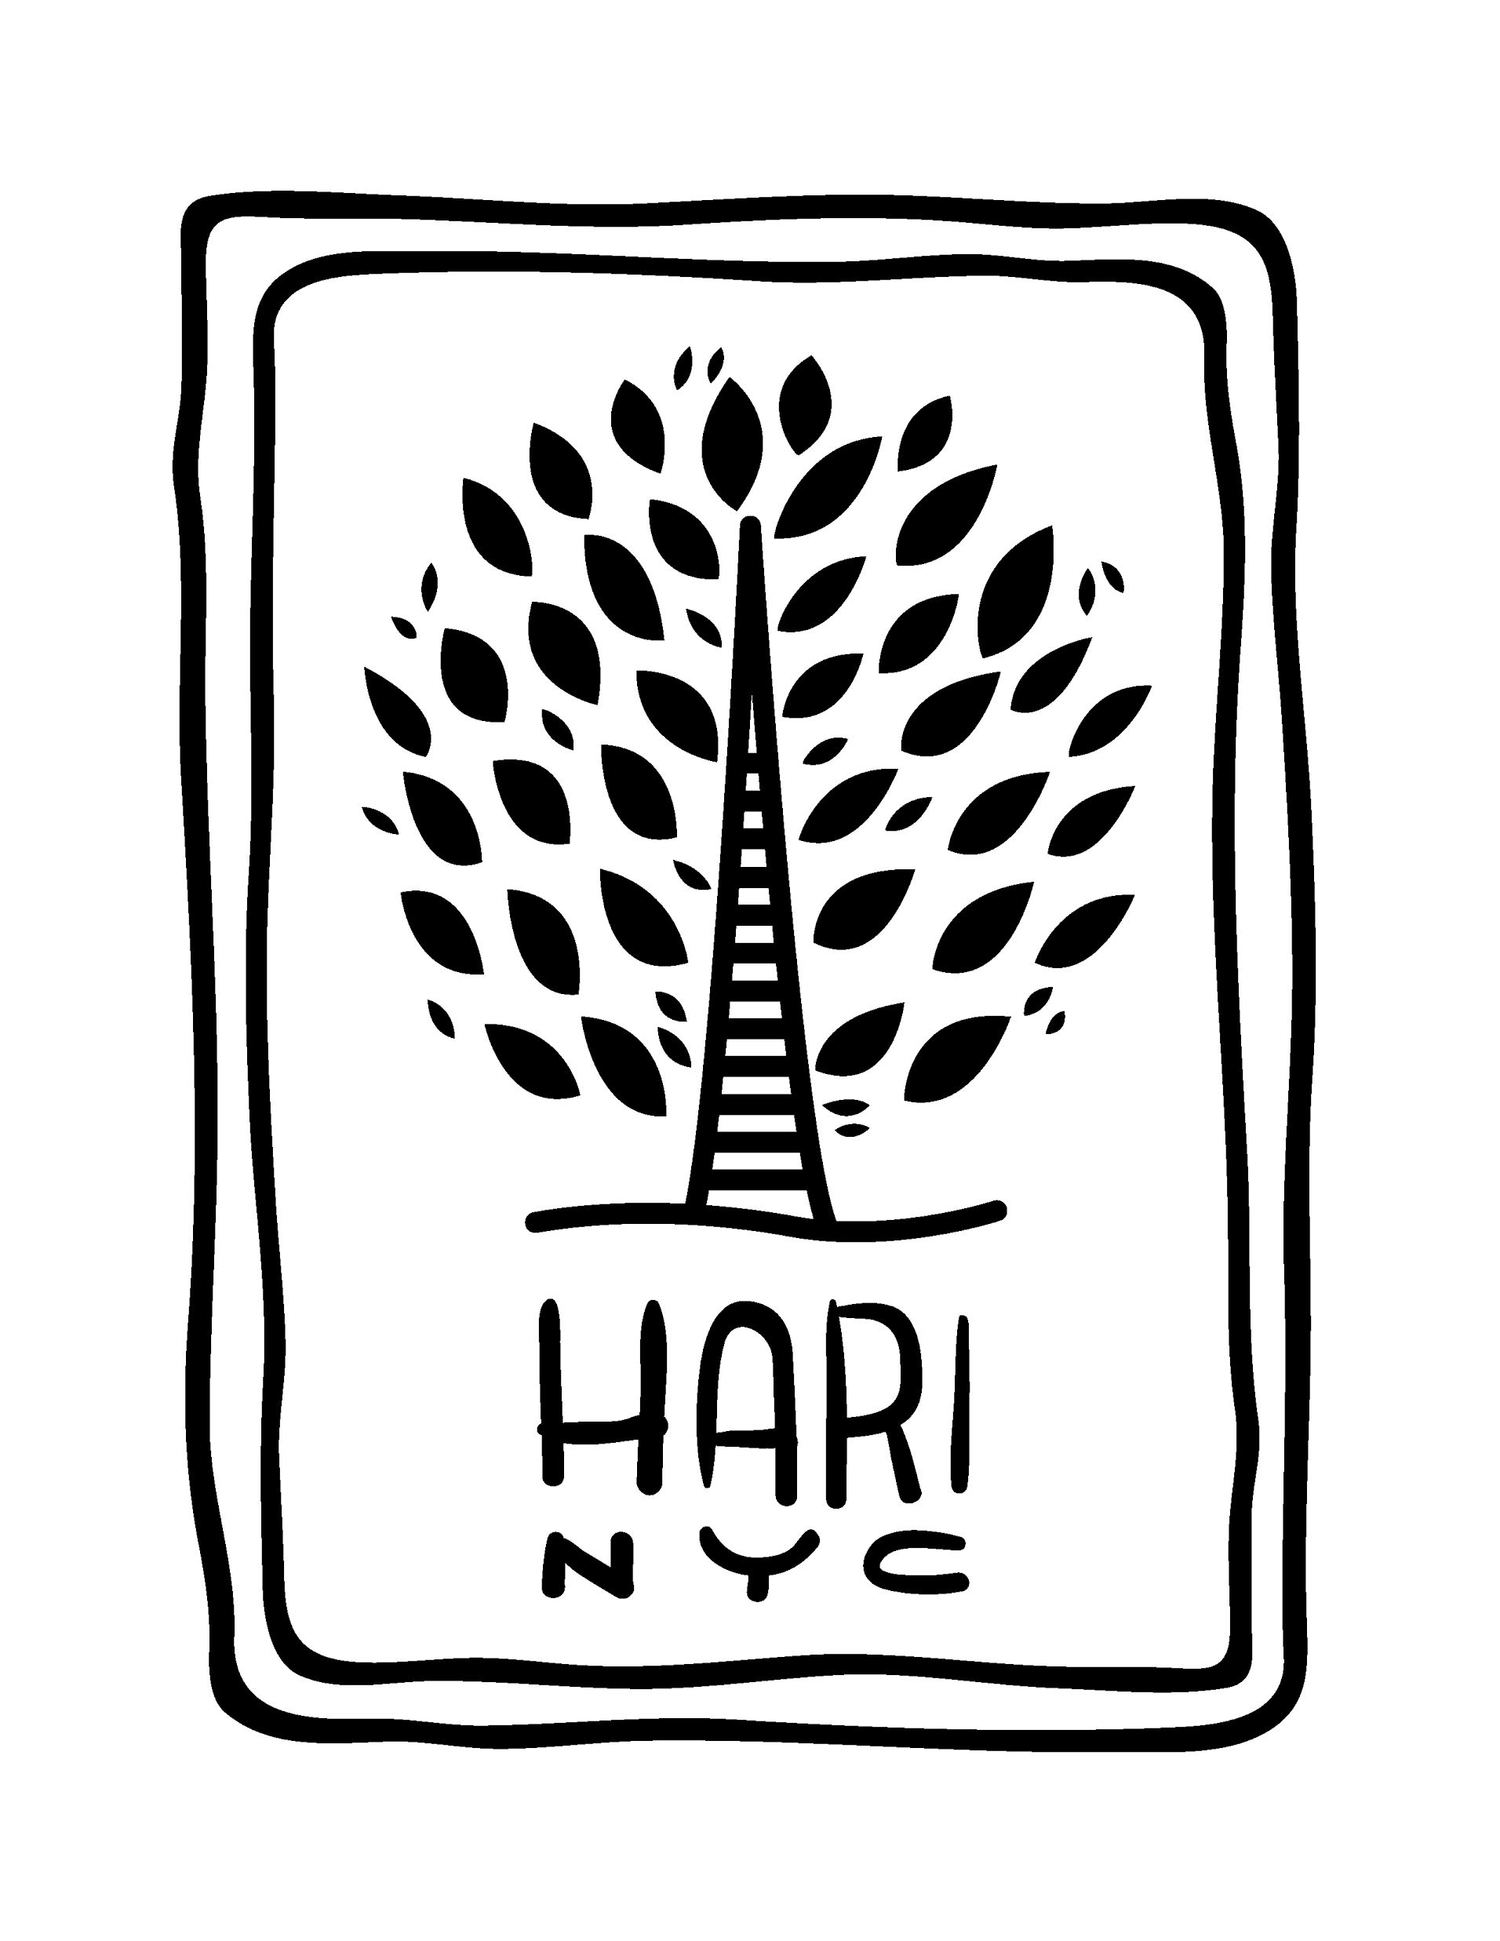 HARI NYC.jpg